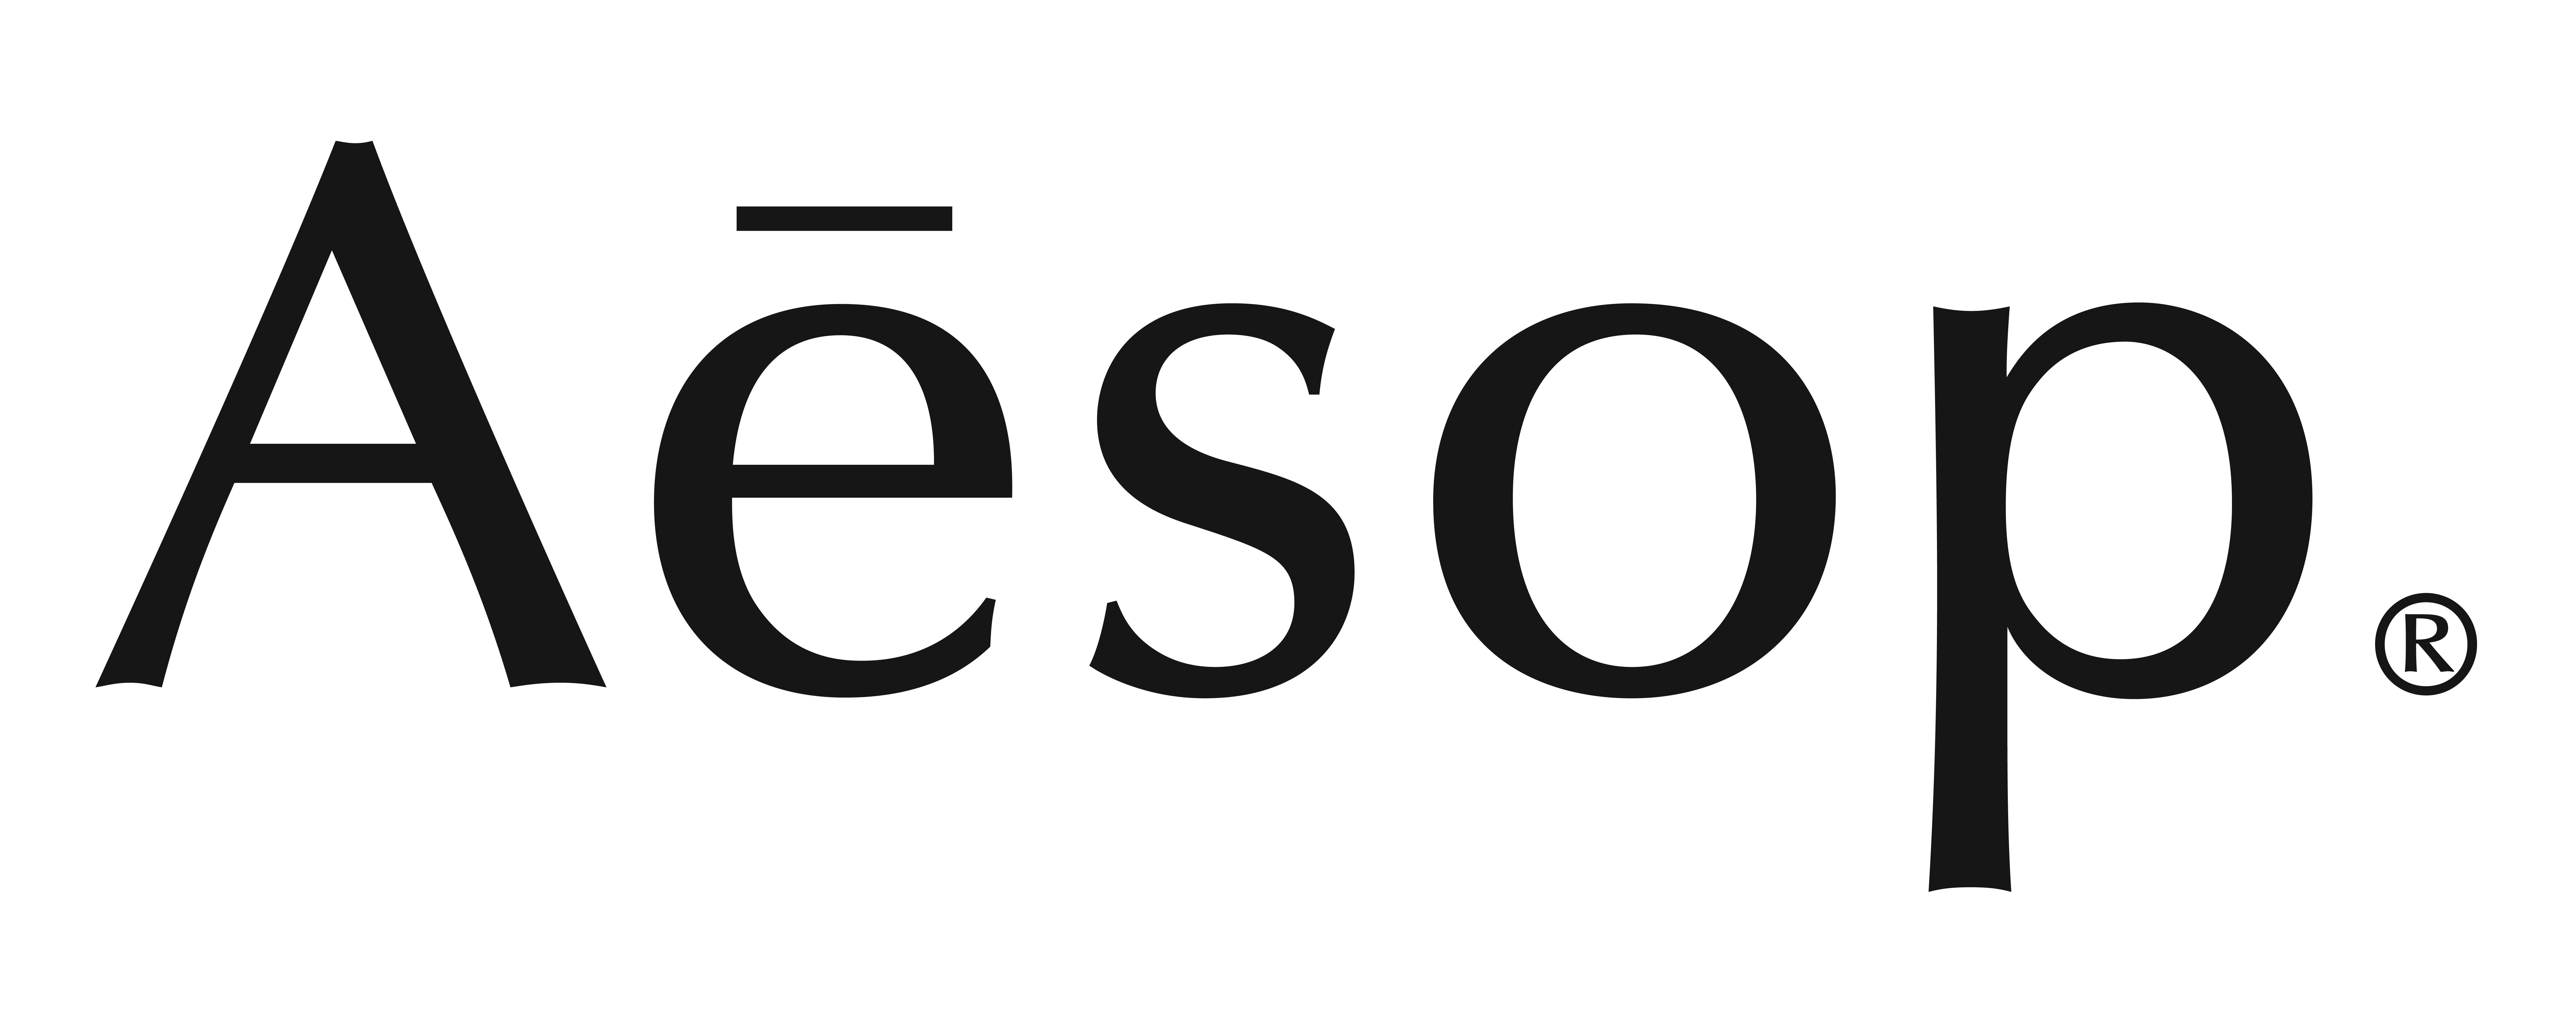 AESOP LOGO MASTER BASIC HIGH RES.jpg